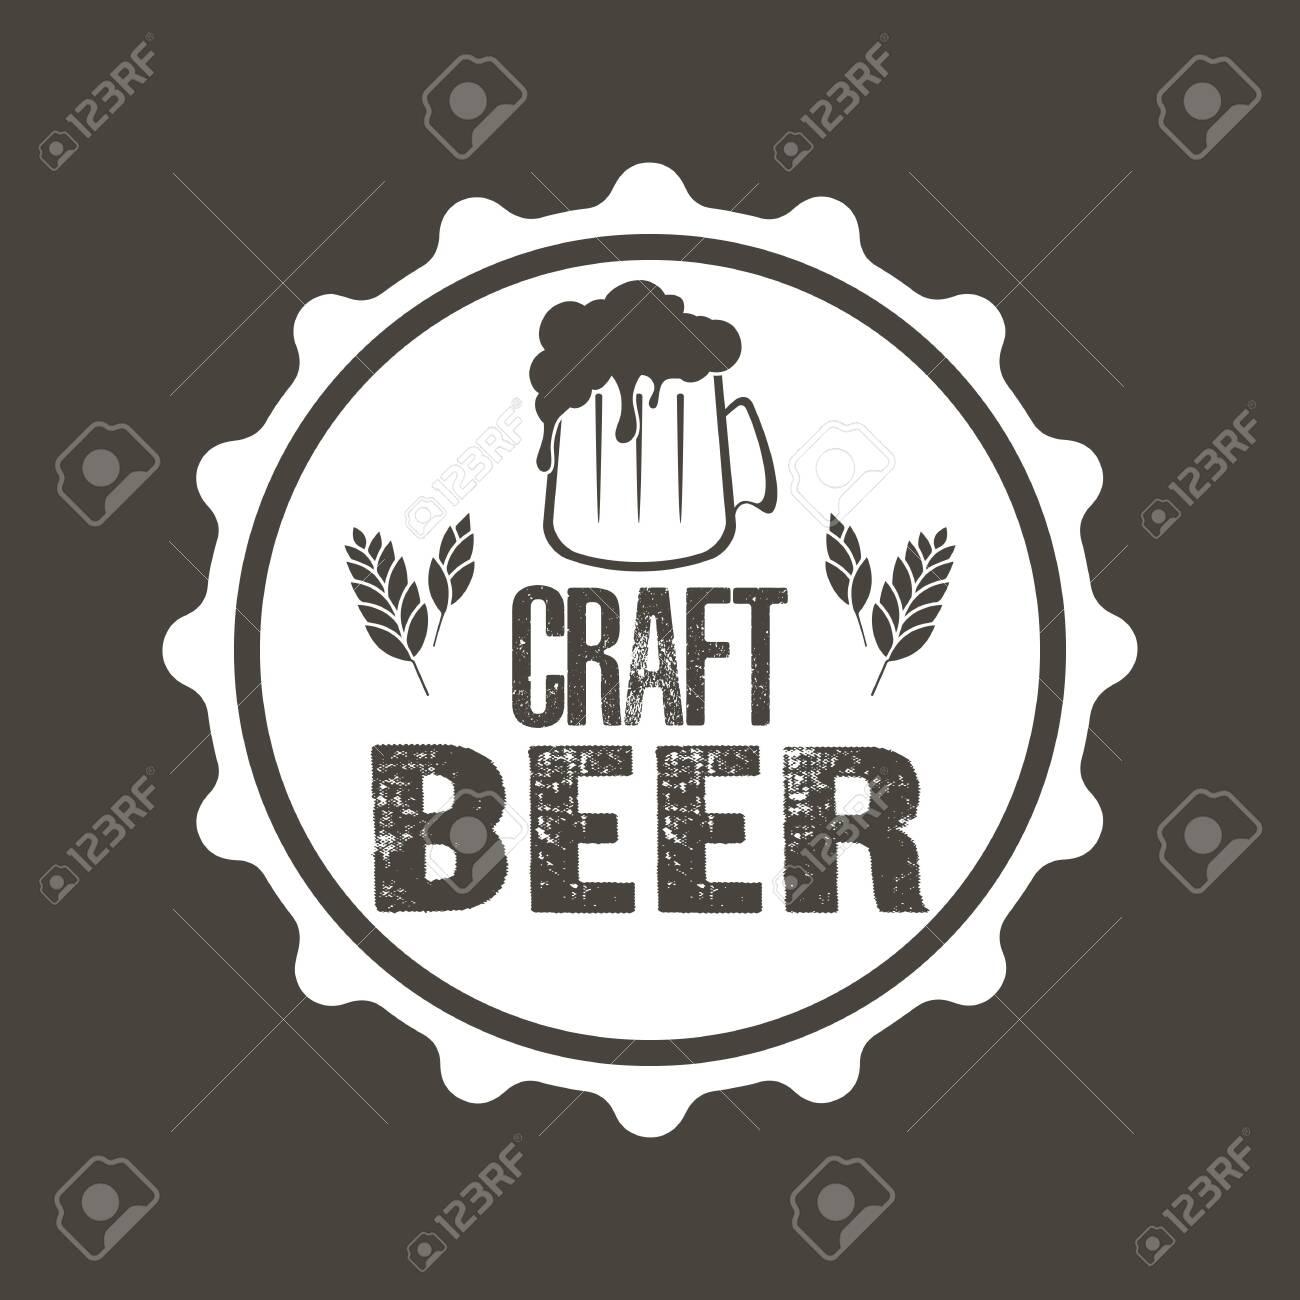 Beer typography. Beer logo template design. Grunge Style. Beer advertising. Vector illustration - 128413841